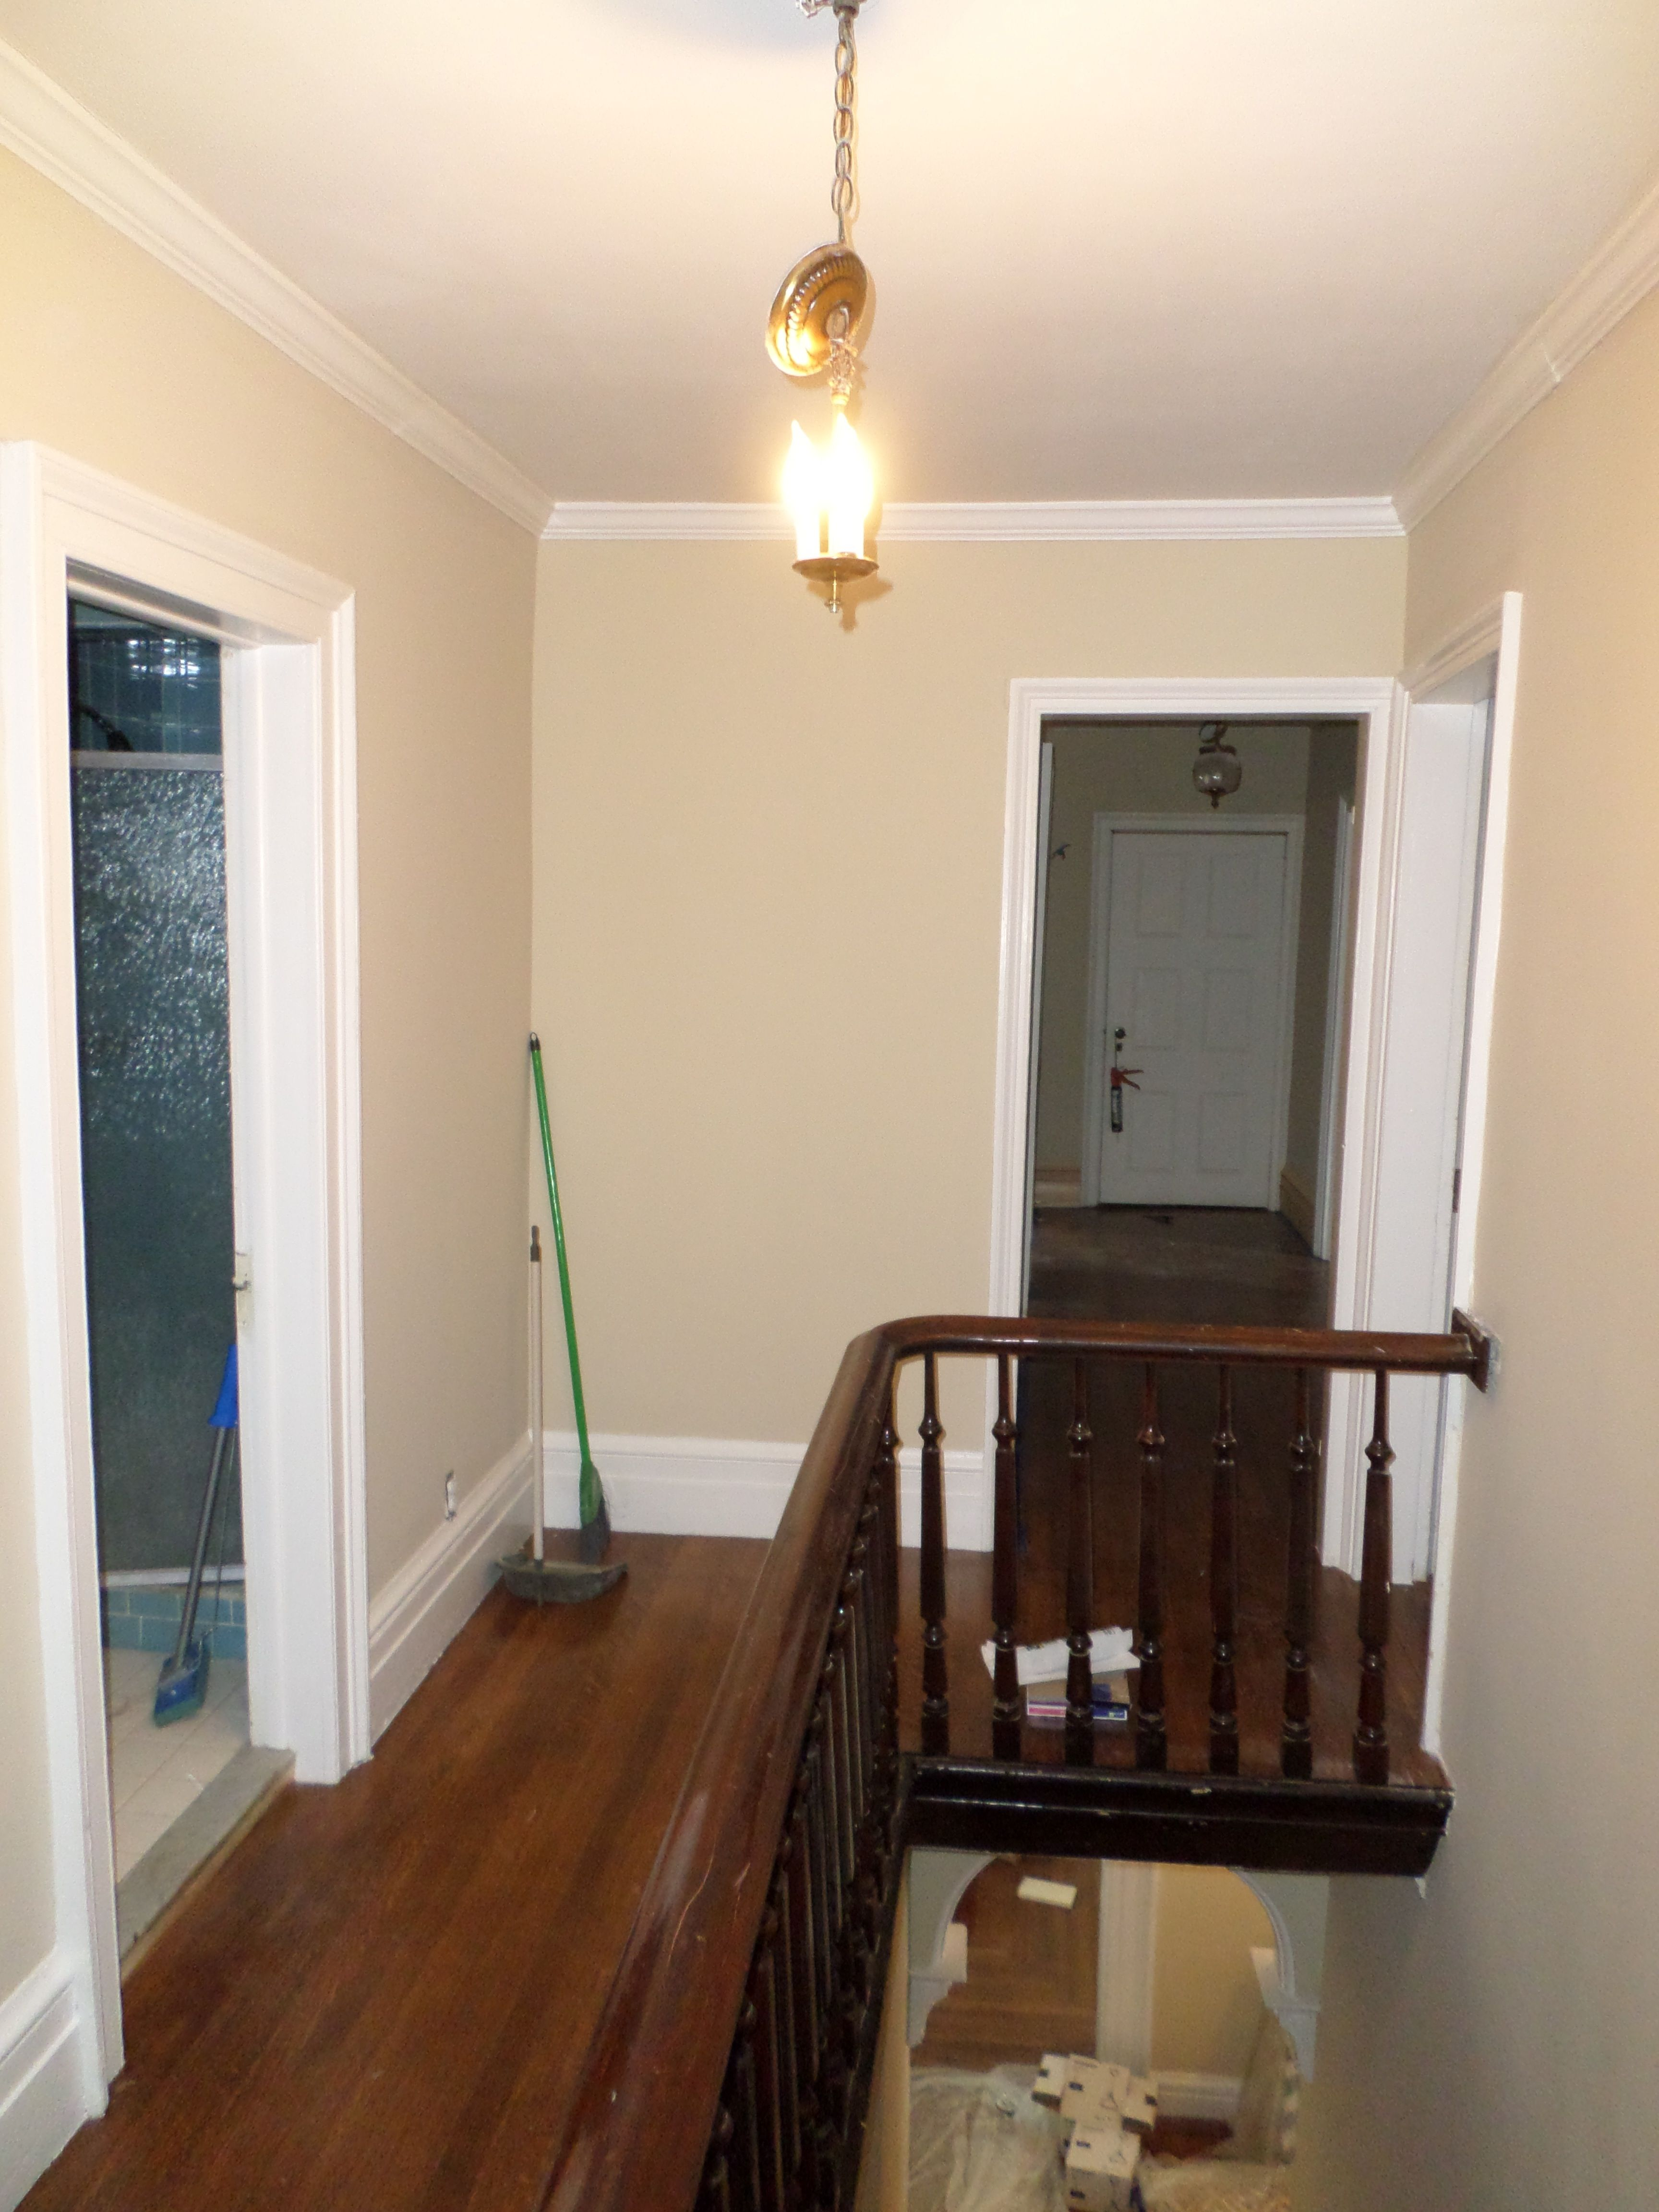 Lenox tan benjamin moore paint - Upstairs Hall Newly Painted Benjamin Moore Carrington Beige